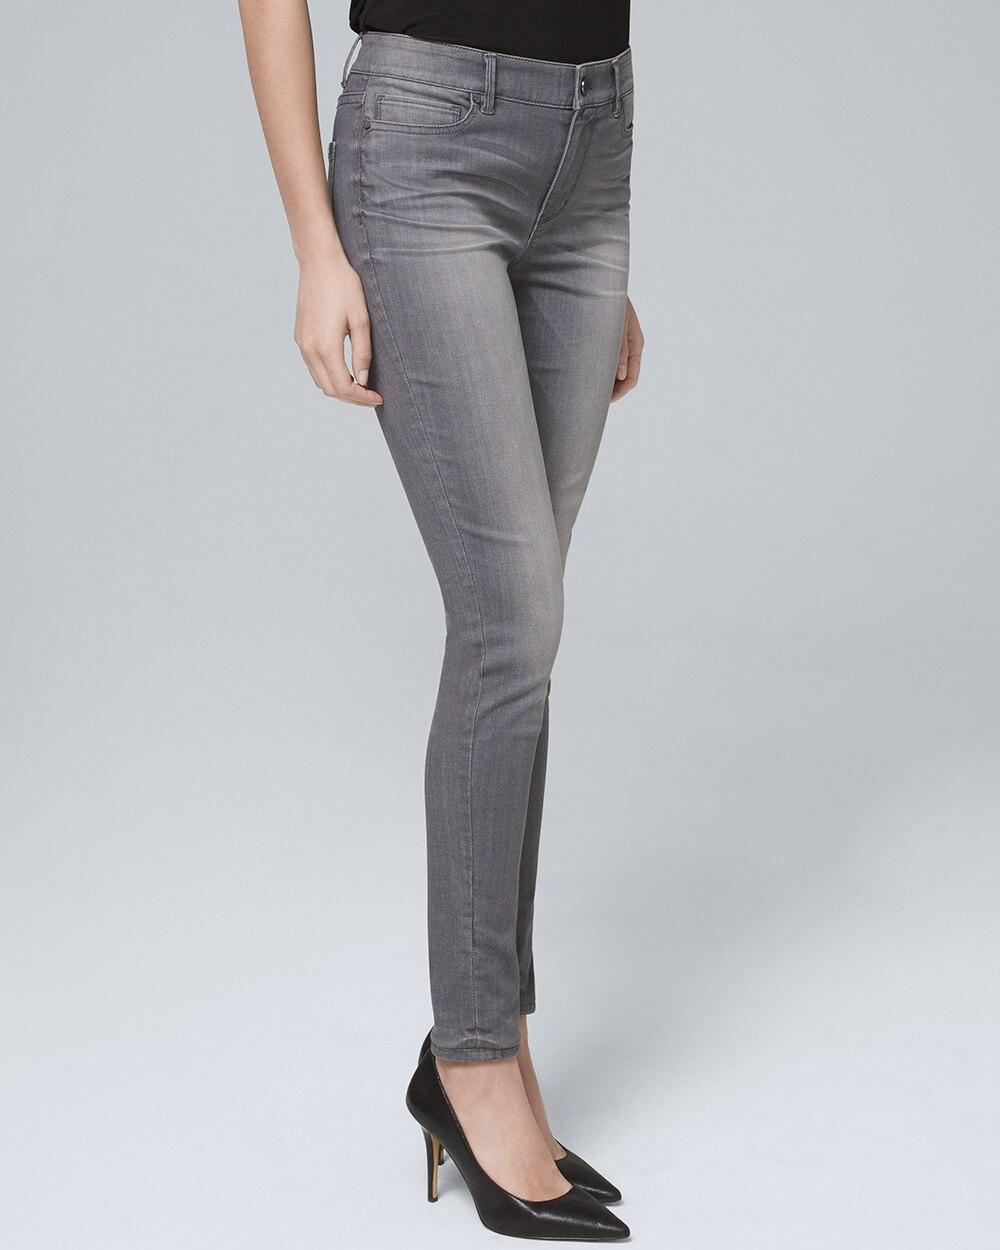 3eab1904d4a32 High-Rise Skinny Jeans - Shop Jeans For Women - Skinny, Bootcut, Leggings &  More - White House Black Market